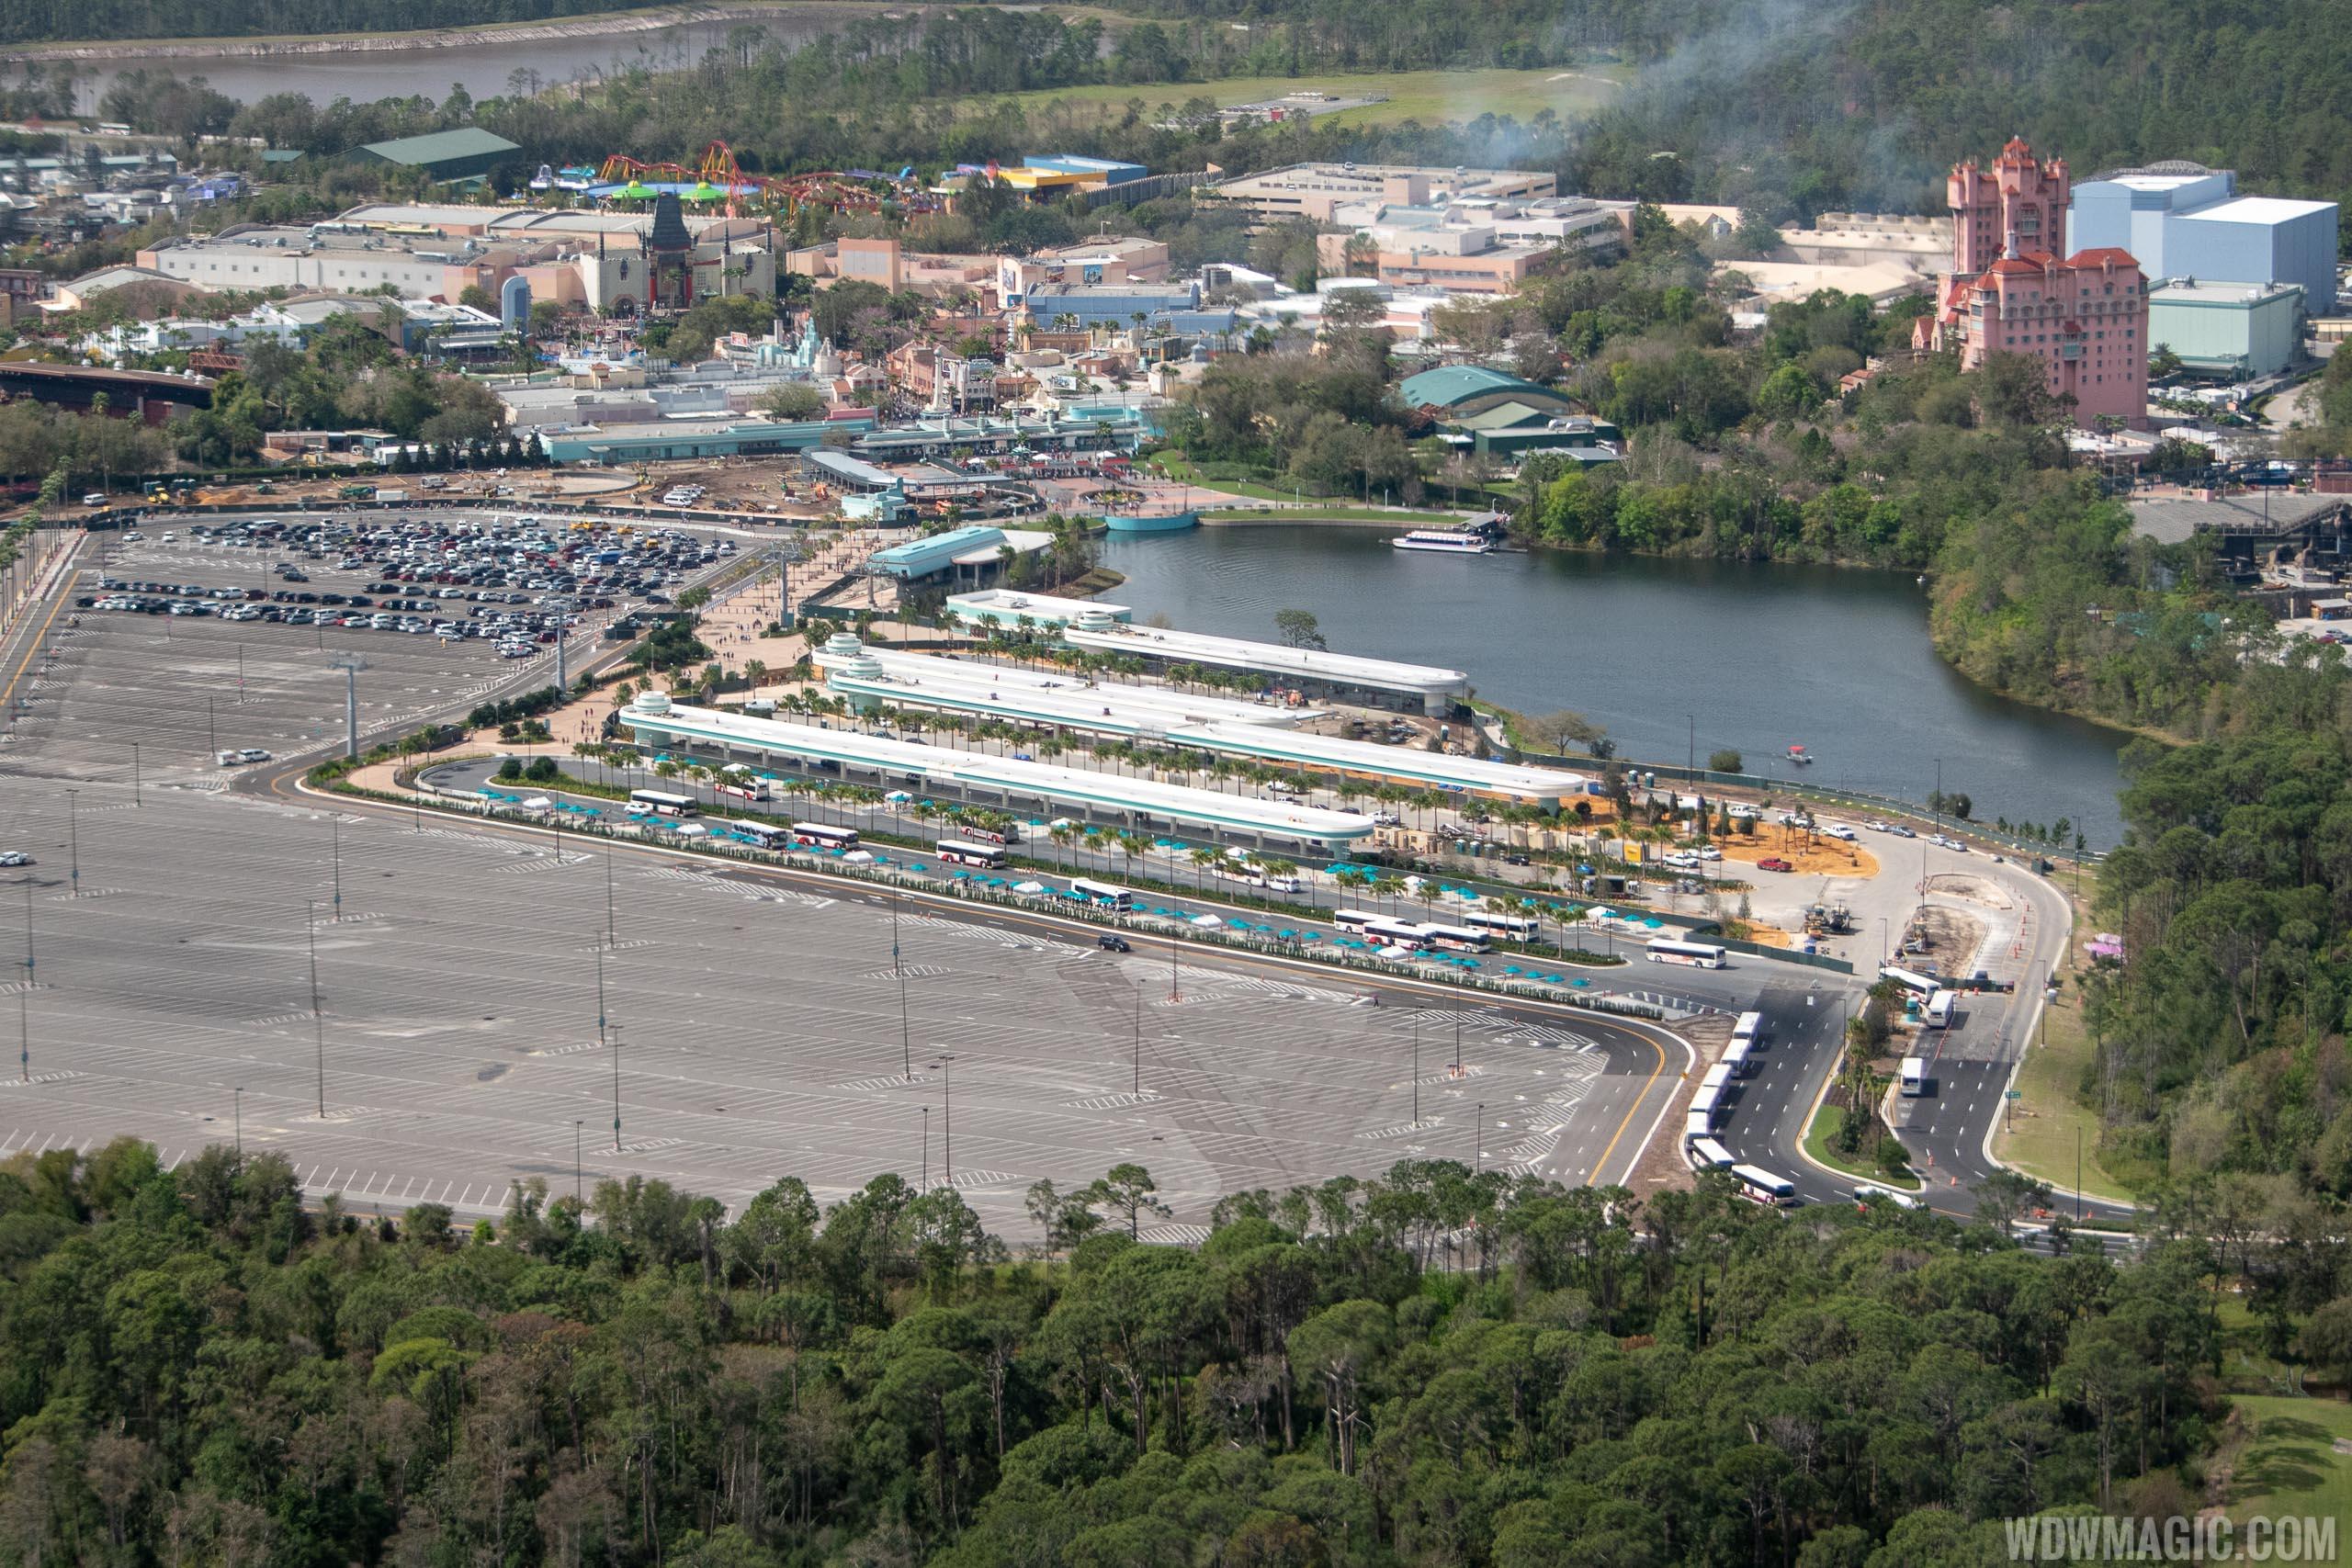 Disney's Hollywood Studios main entrance construction - February 2019